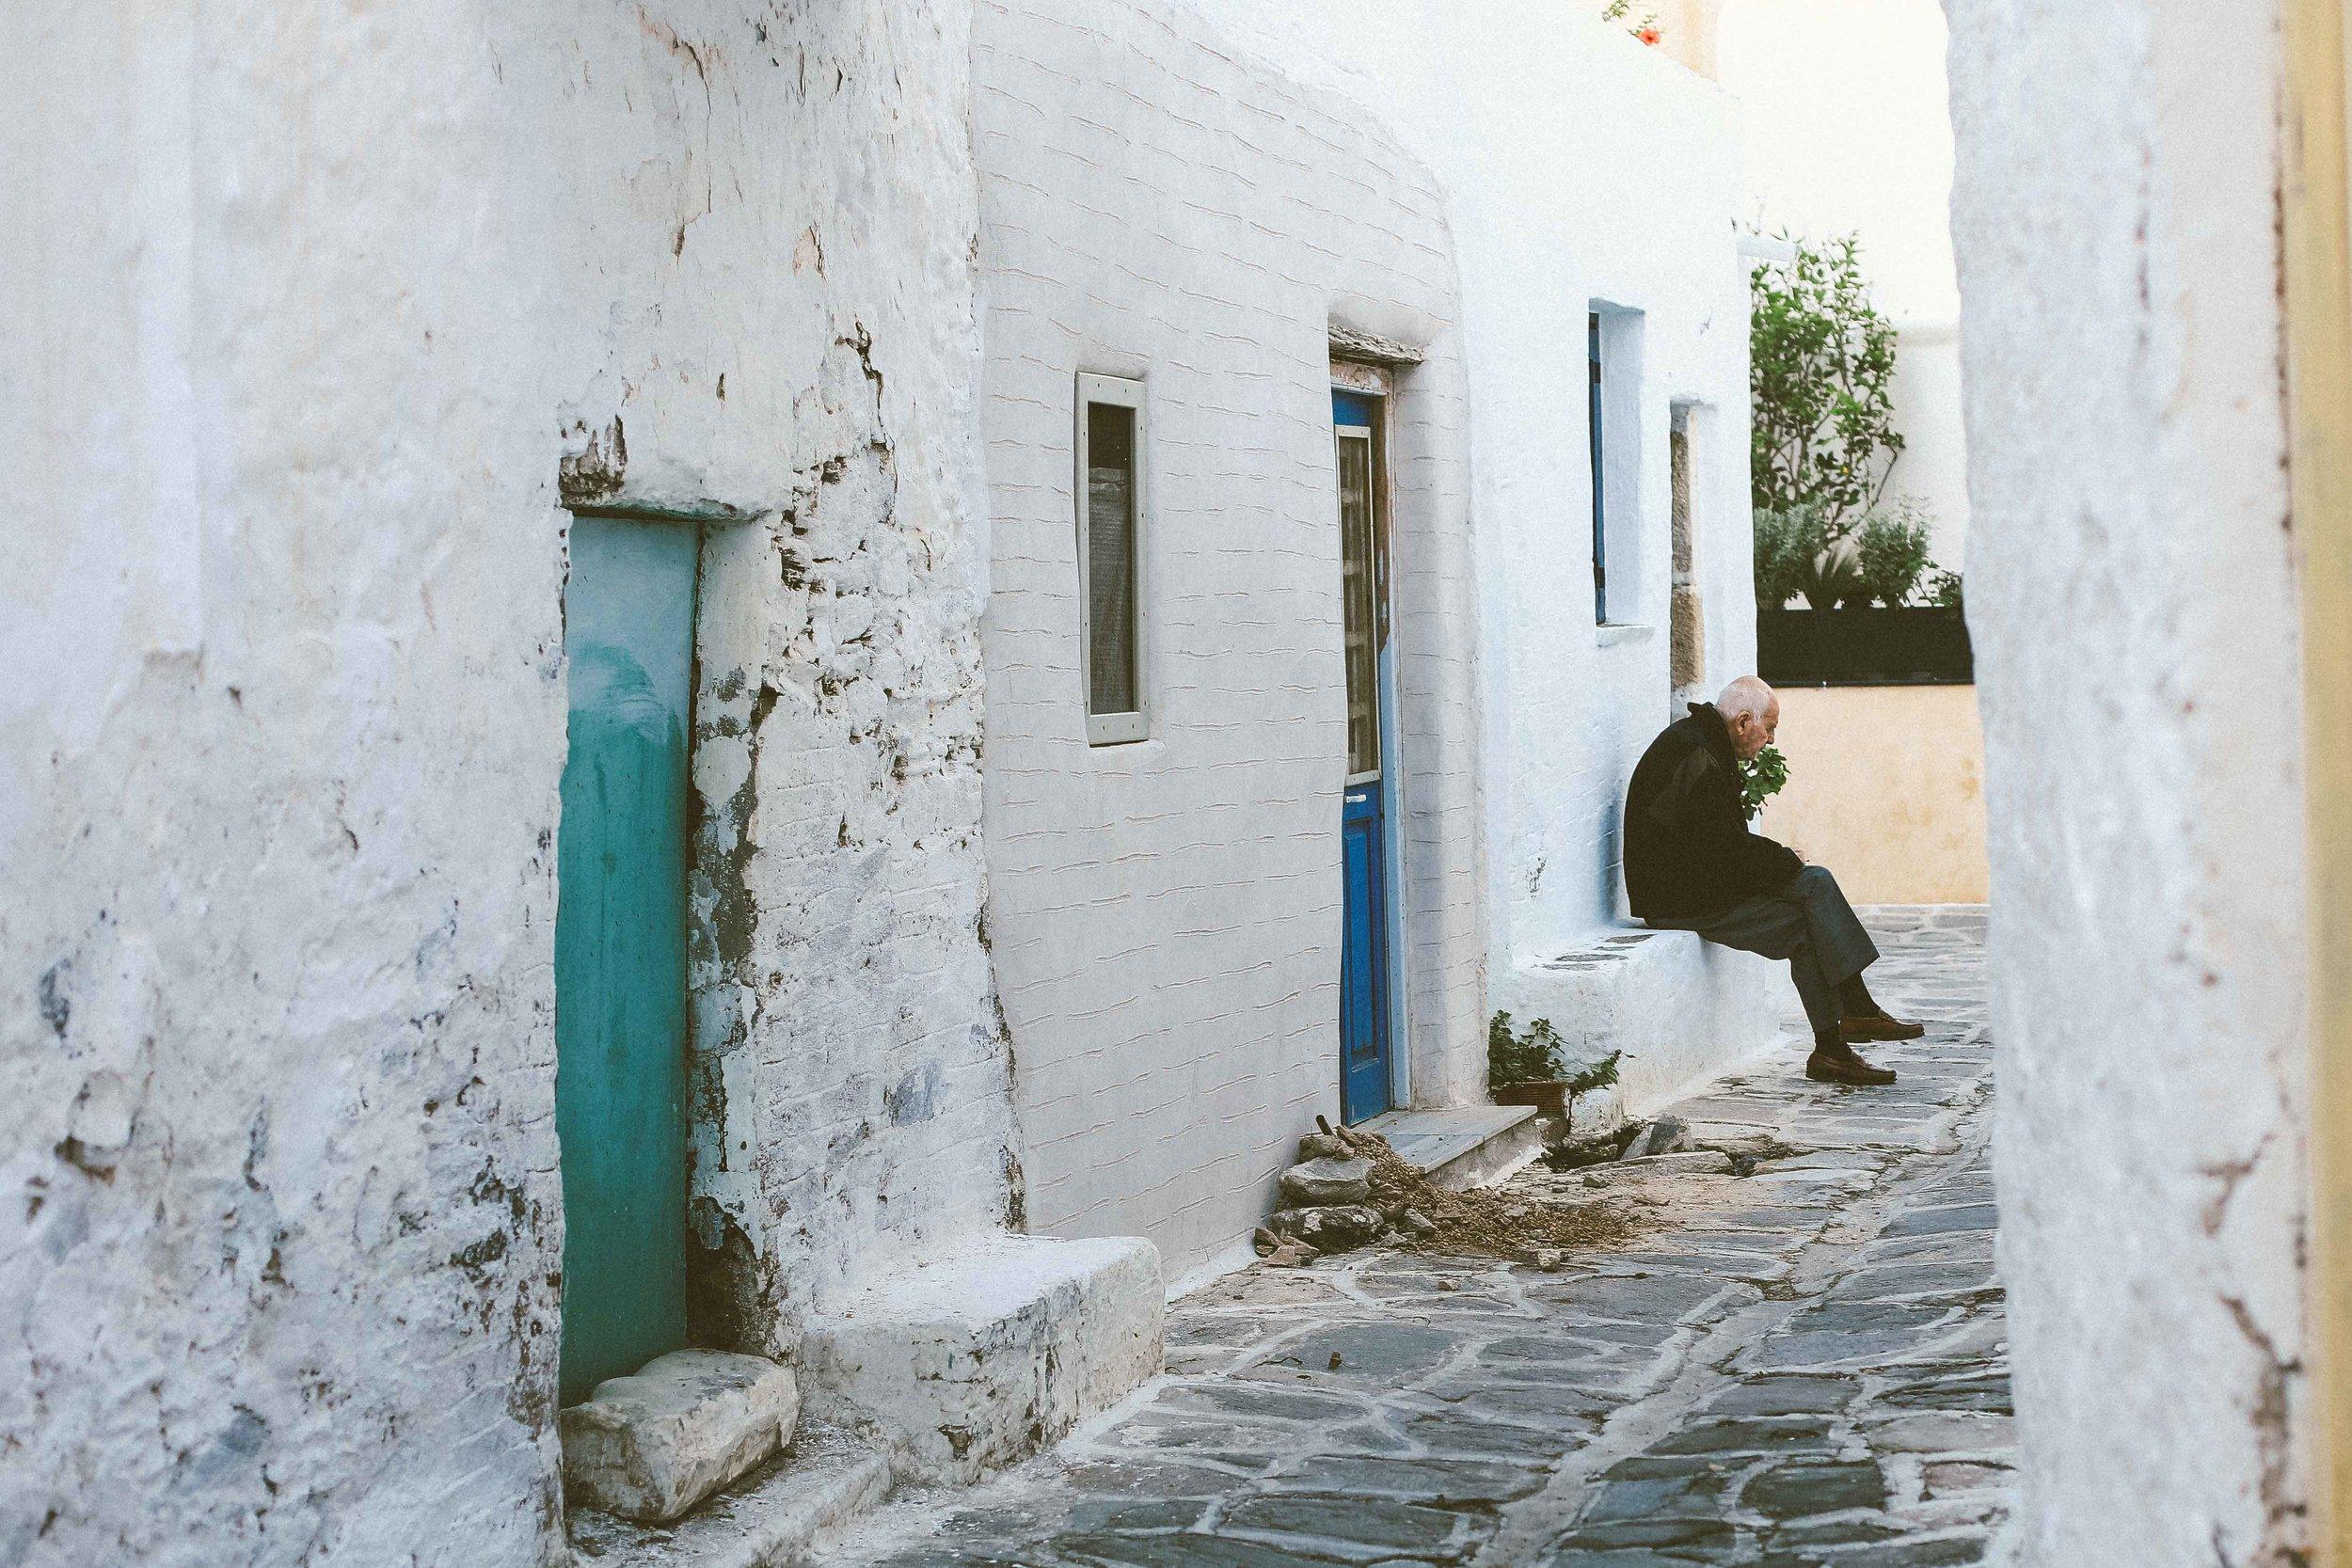 Street_Photography_Greece